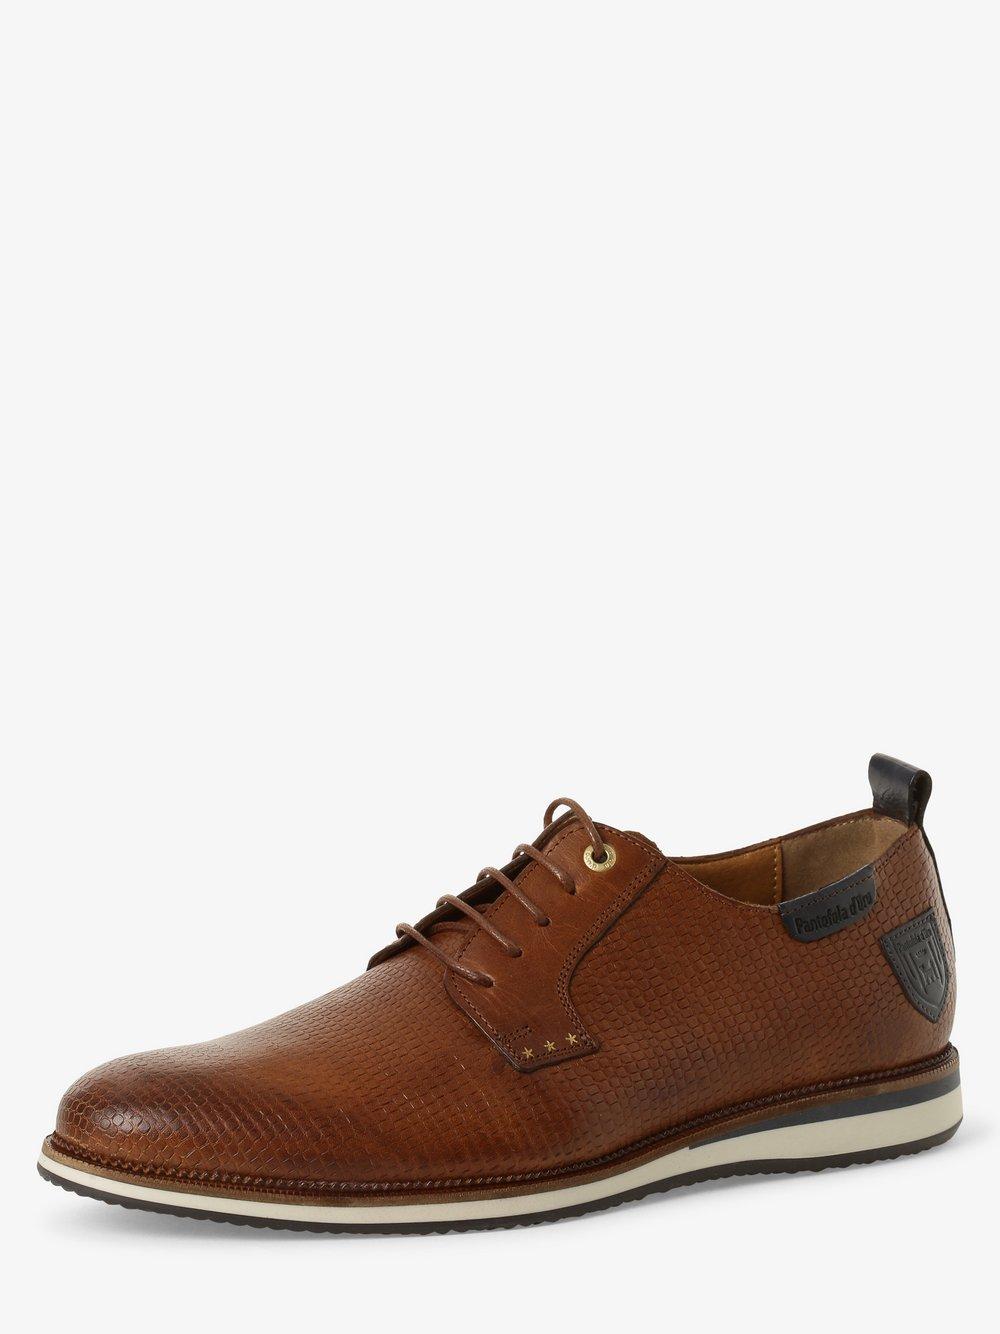 Pantofola d'Oro – Męskie buty sznurowane ze skóry, beżowy Van Graaf 466214-0001-00400